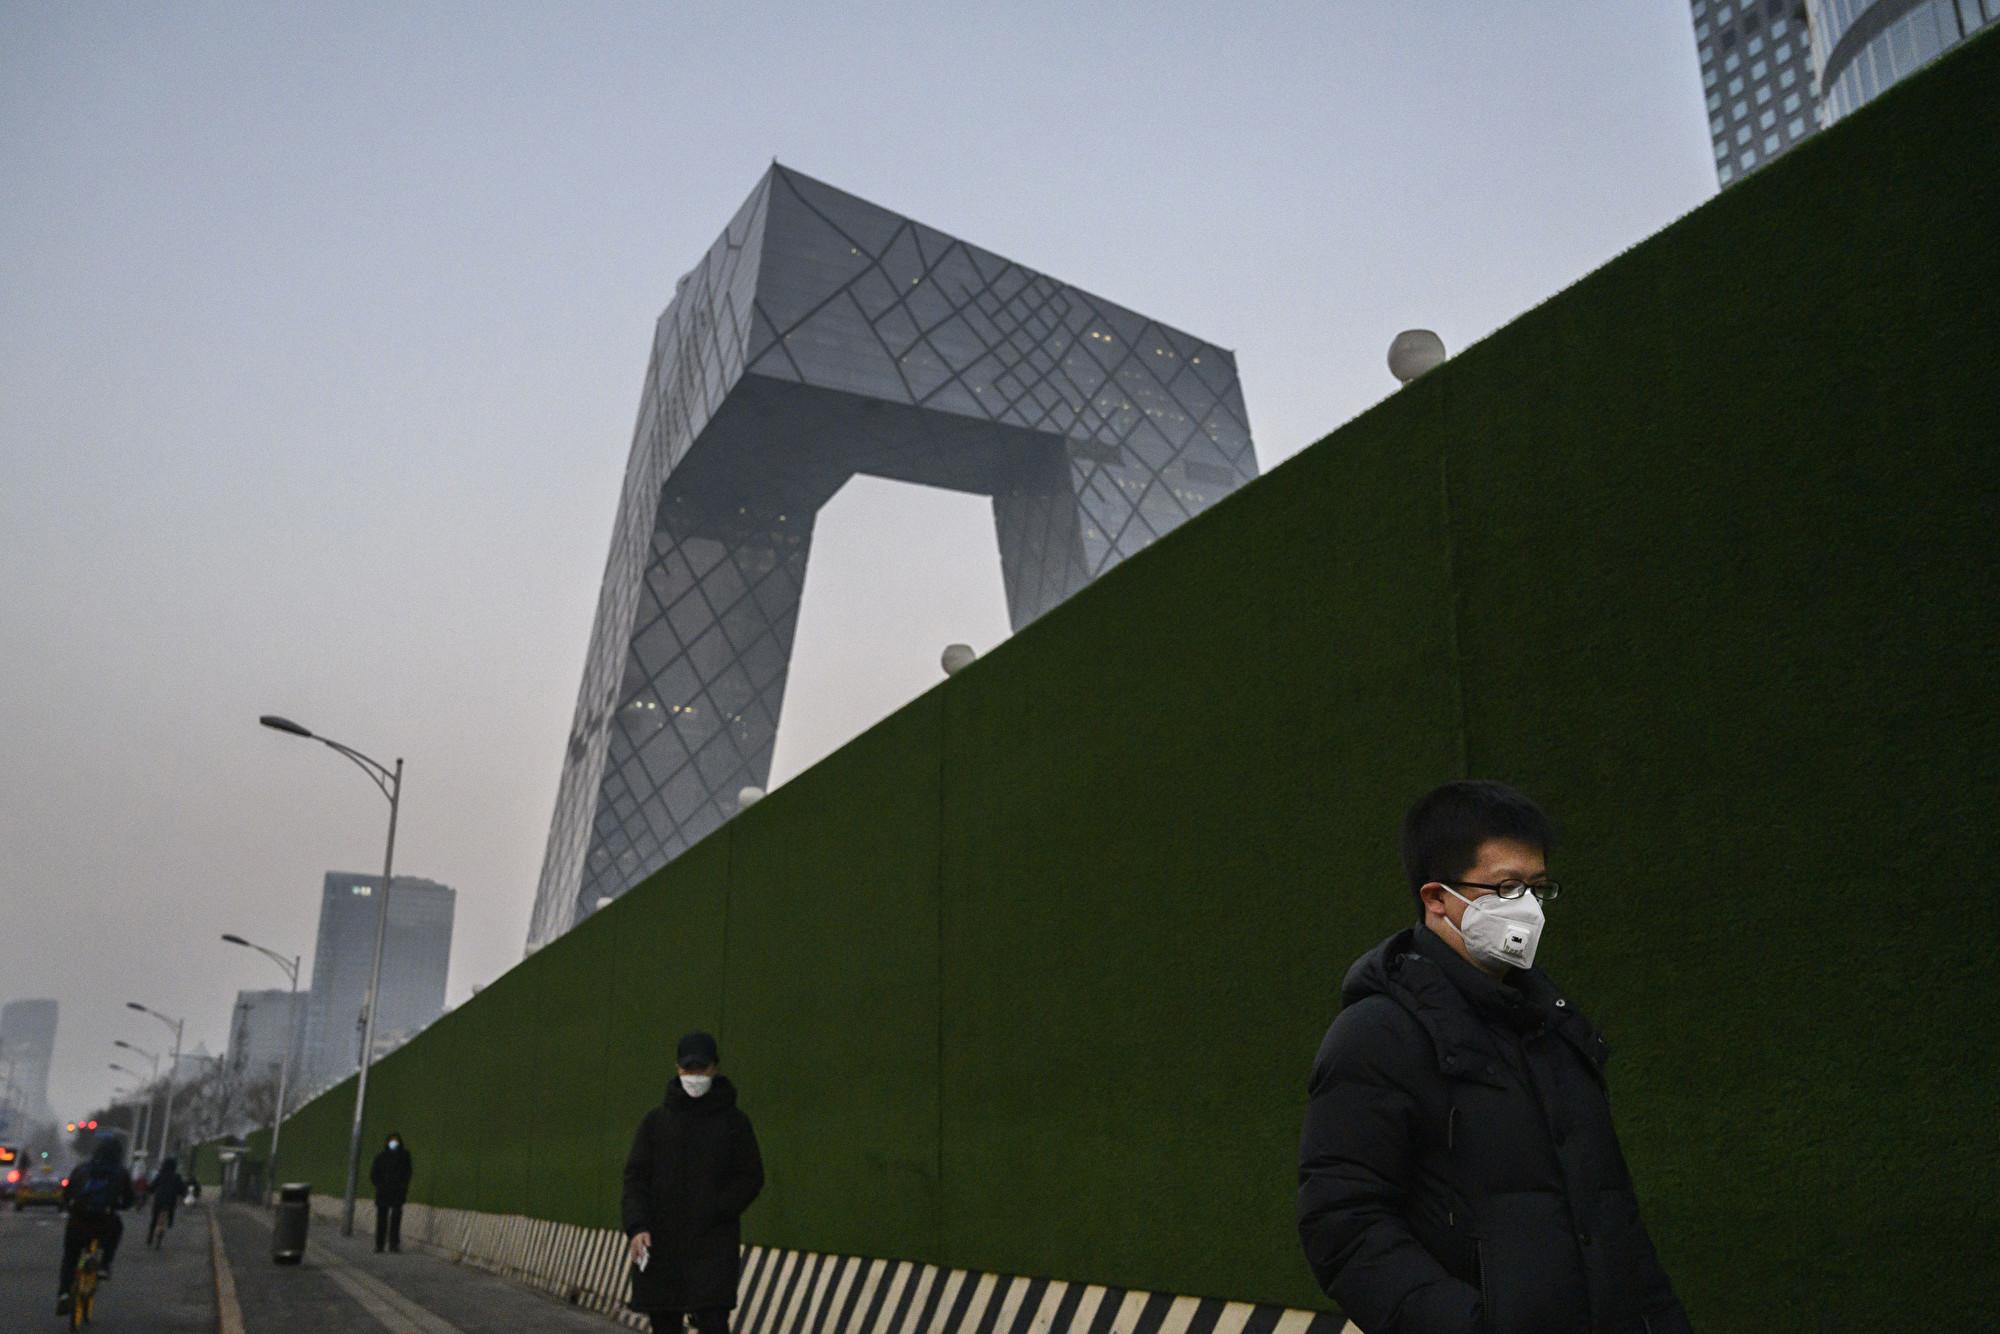 2月10日,人們戴著防毒面具在北京街道上行走。(Kevin Frayer/Getty Images)